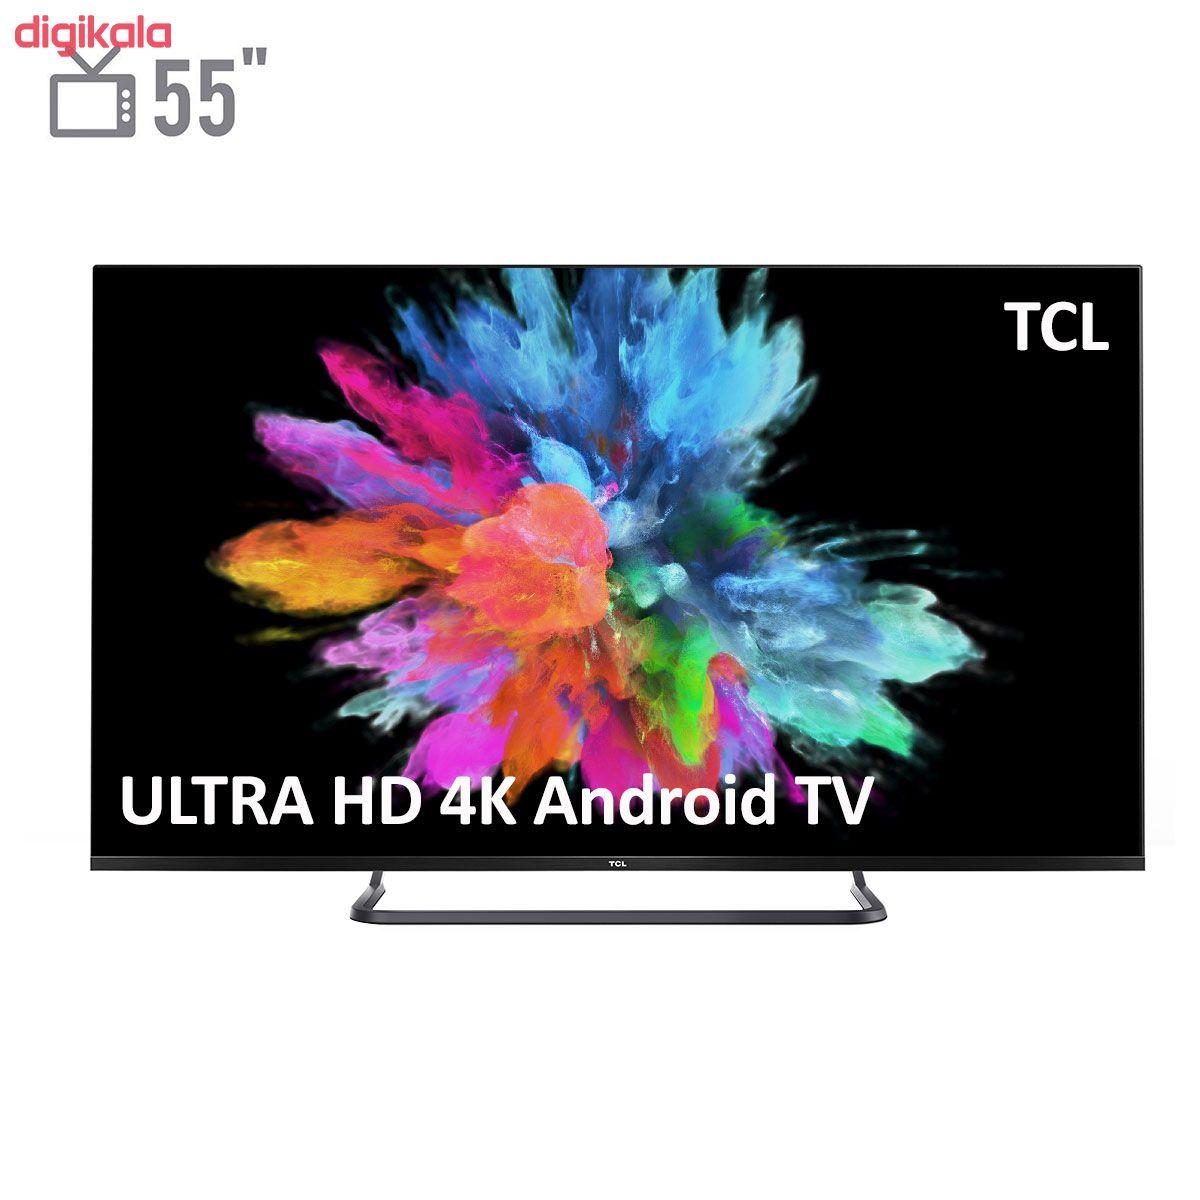 تلویزیون ال ای دی هوشمند تی سی ال مدل 55P8SA سایز 55 اینچ main 1 5